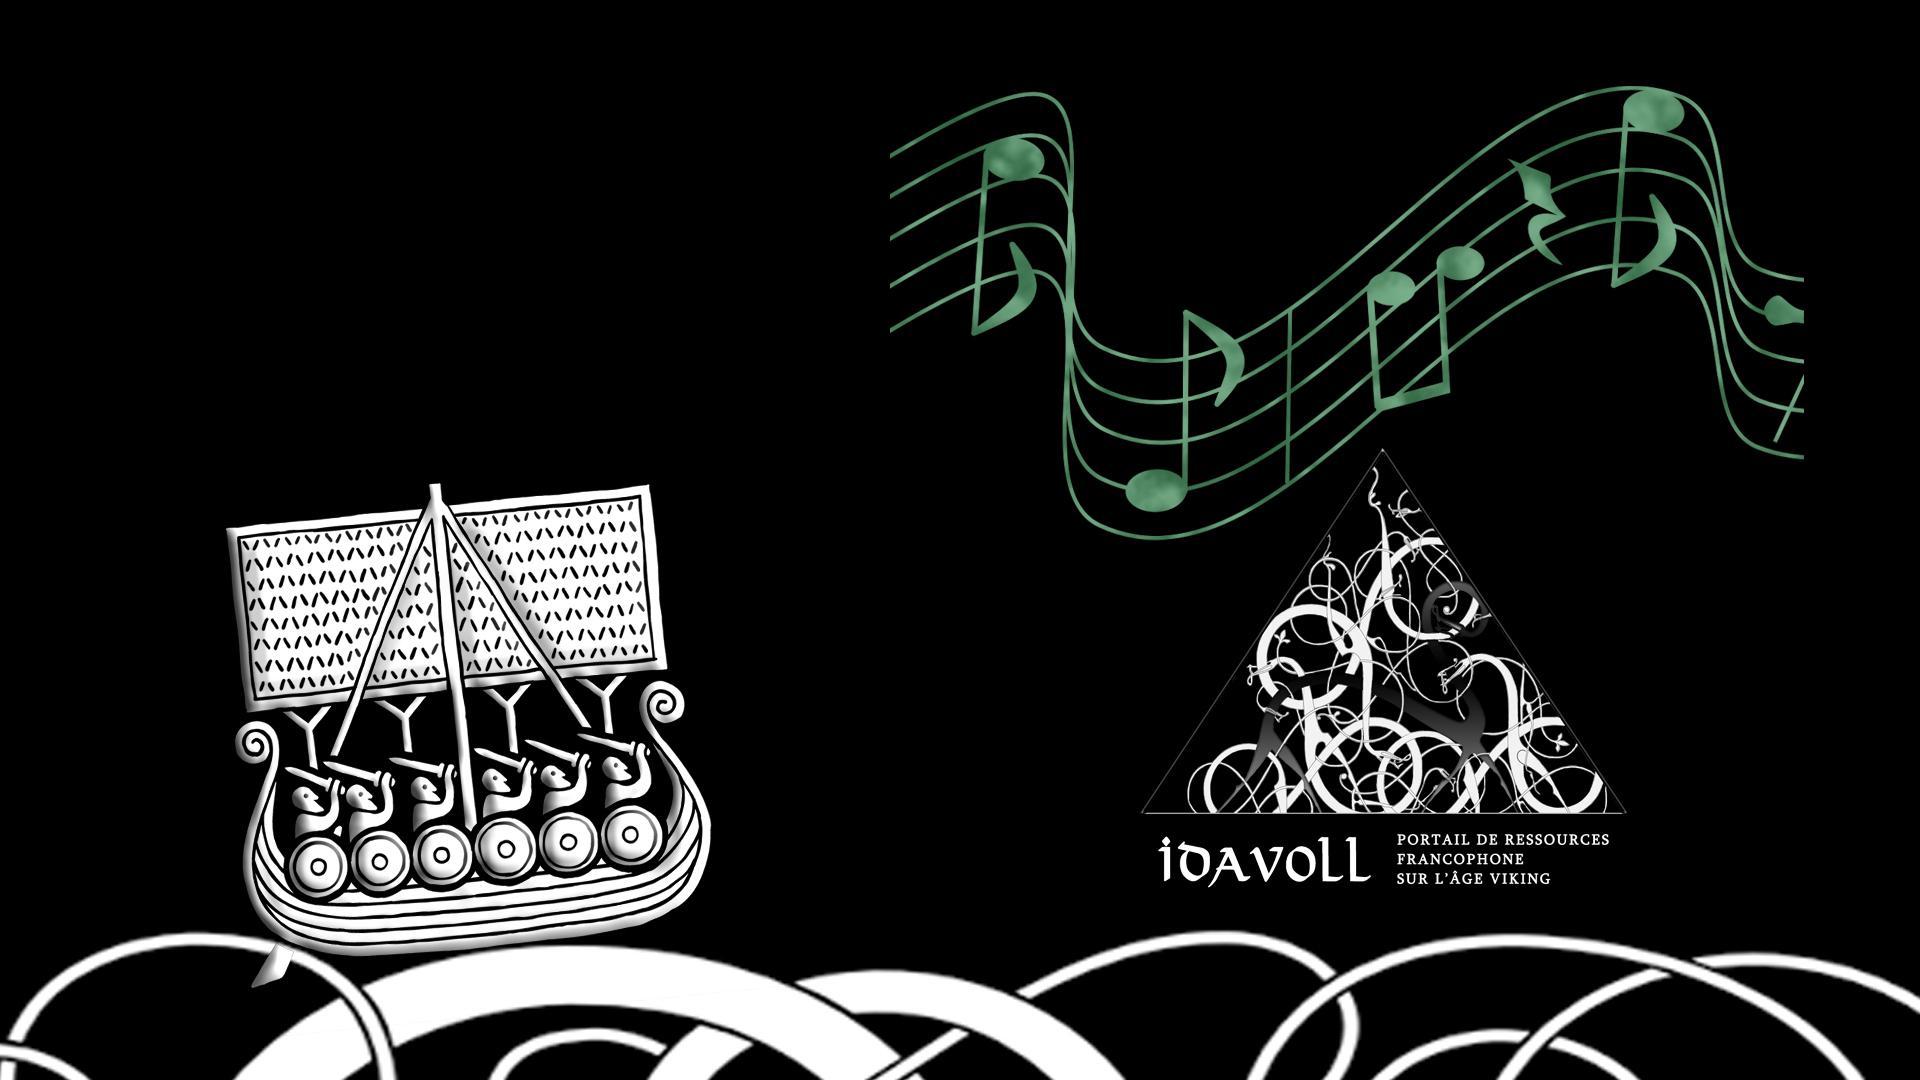 Playlist Idavoll